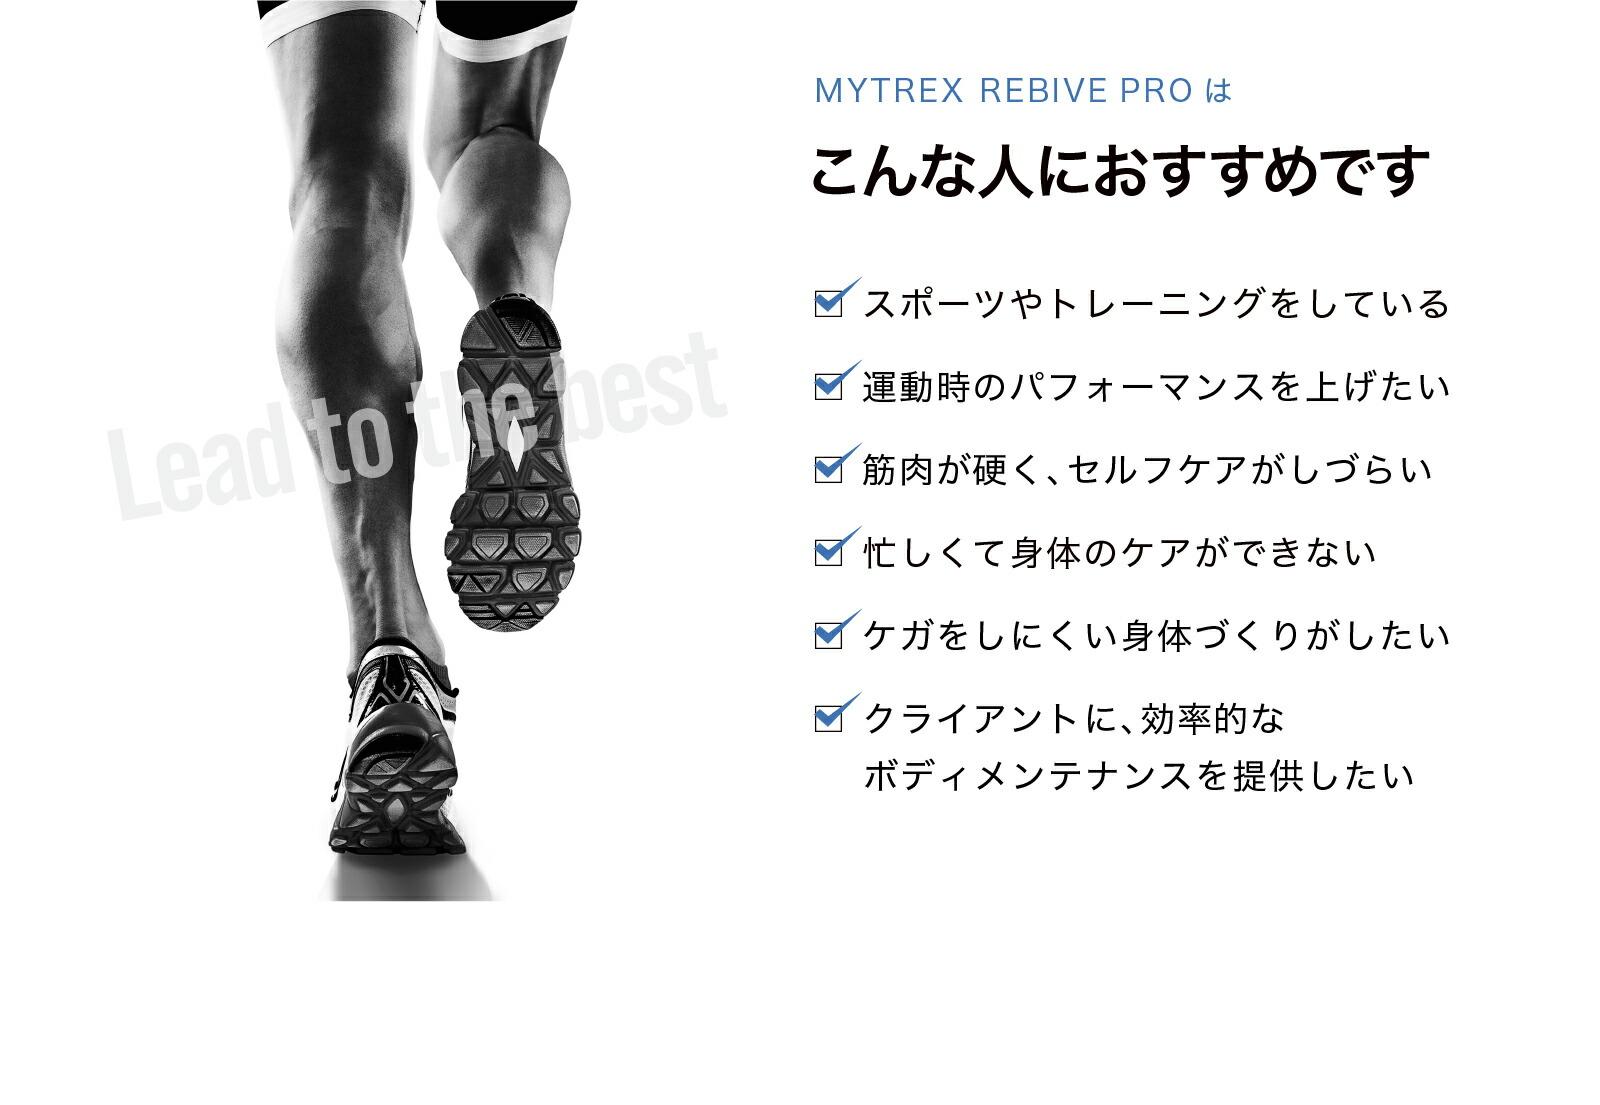 MYTREX REVIBE PRO マイトレックス リバイブ プロ 筋膜リリース マッサージガン